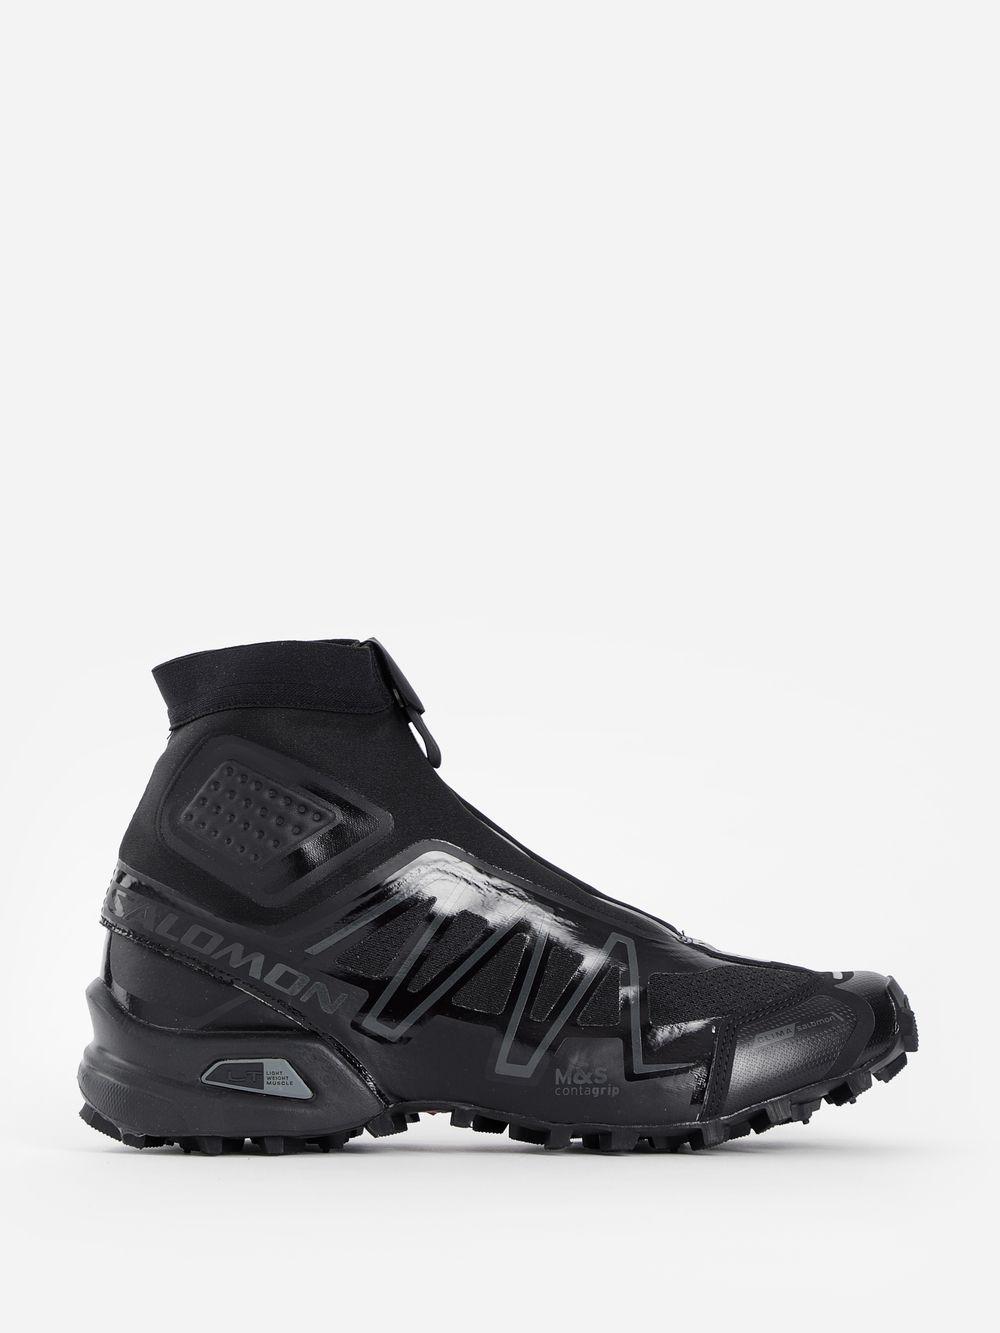 low priced 684a7 ec64a Salomon advanced sneakers c6906 406362 – Artofit